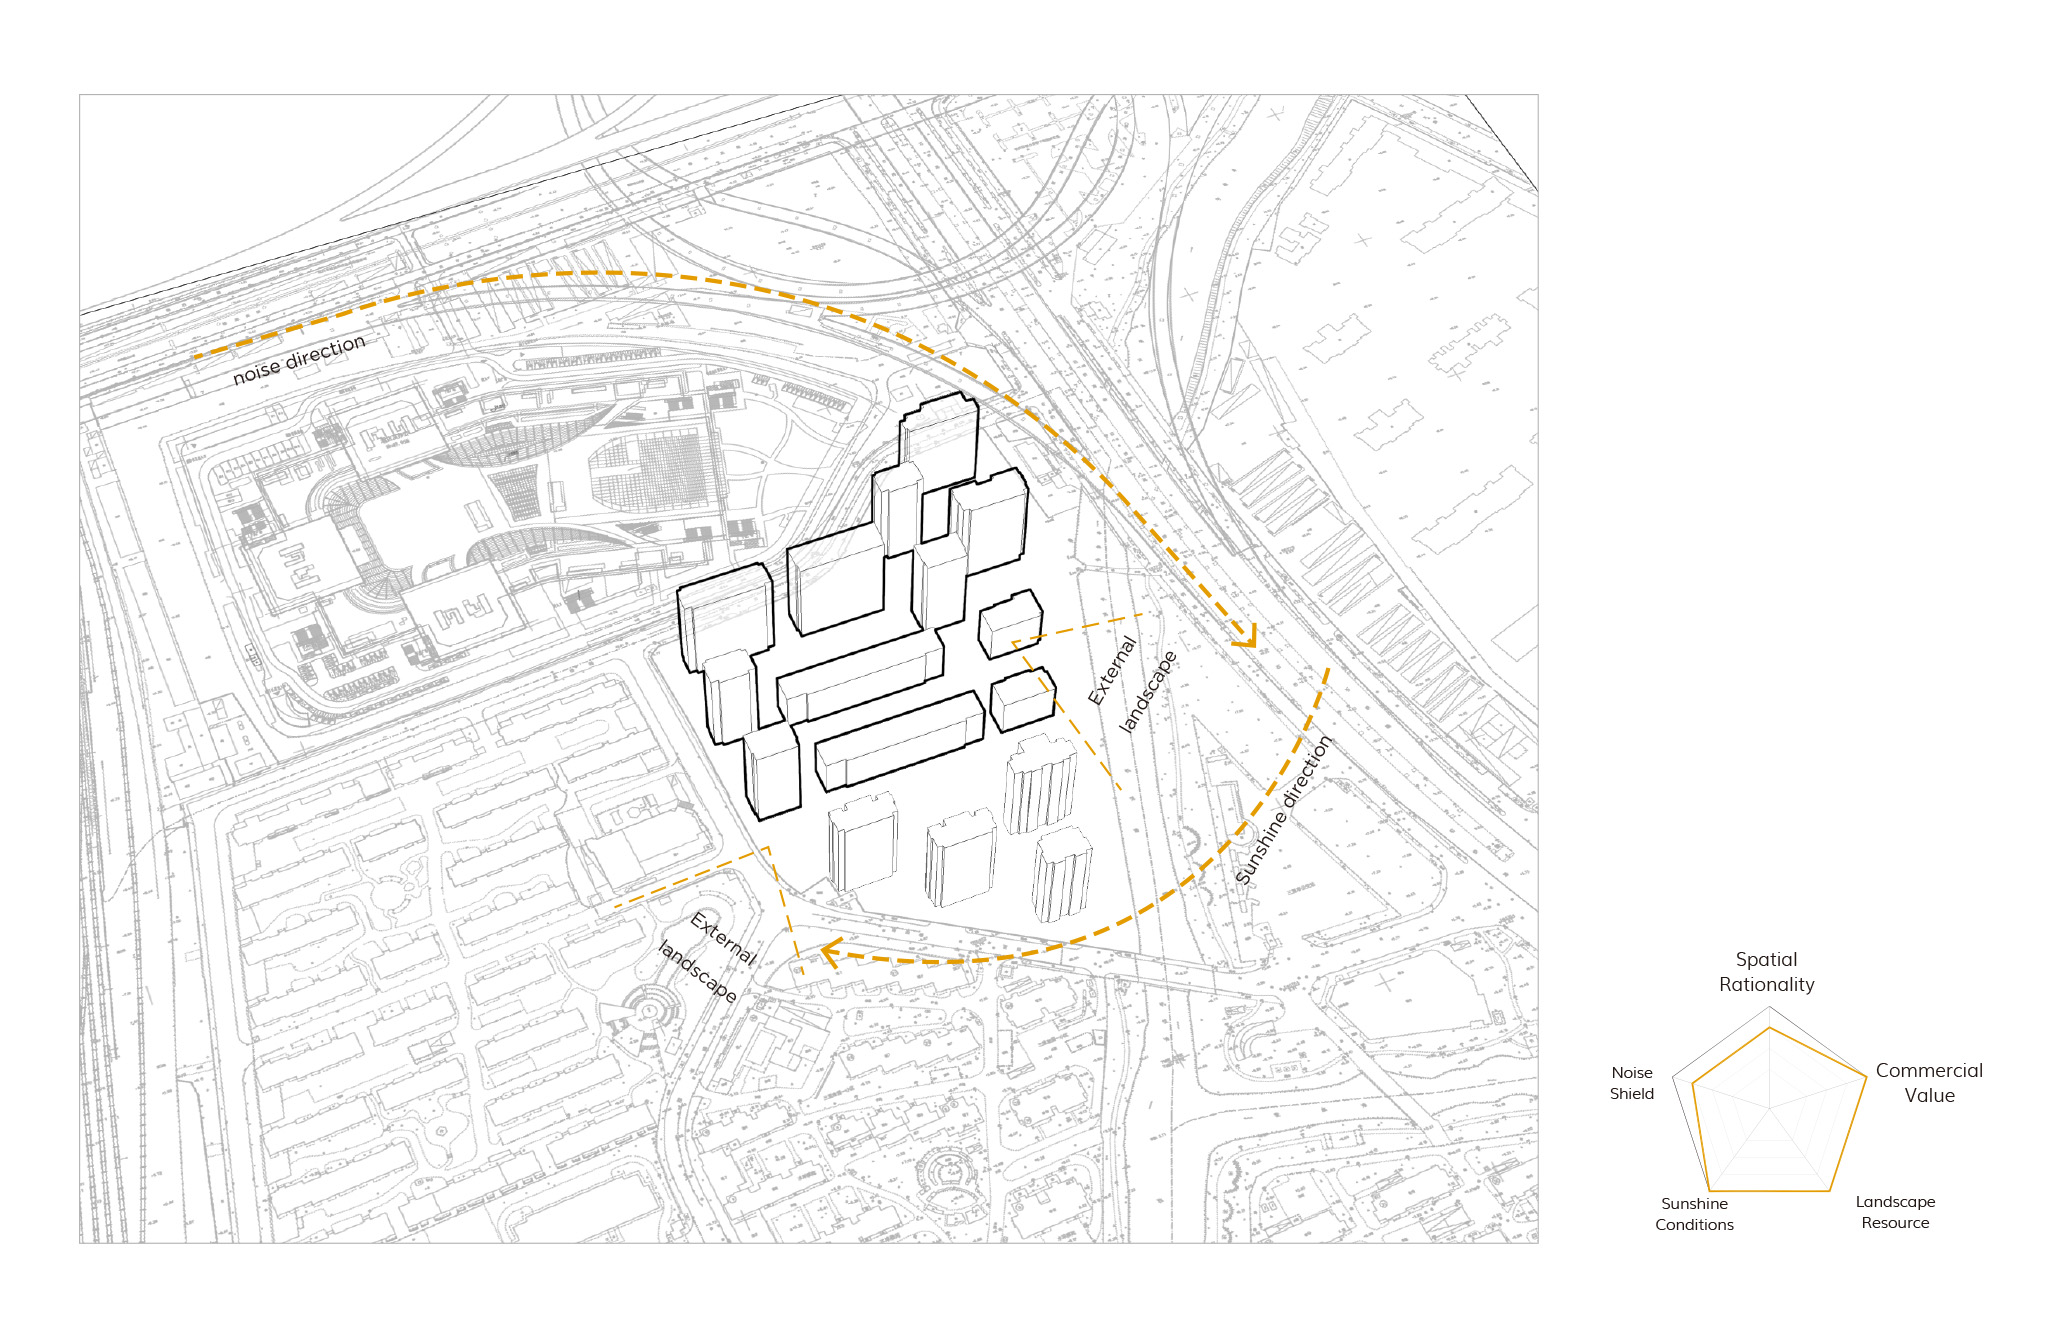 building layout analysis diagram gad · line+ studio}